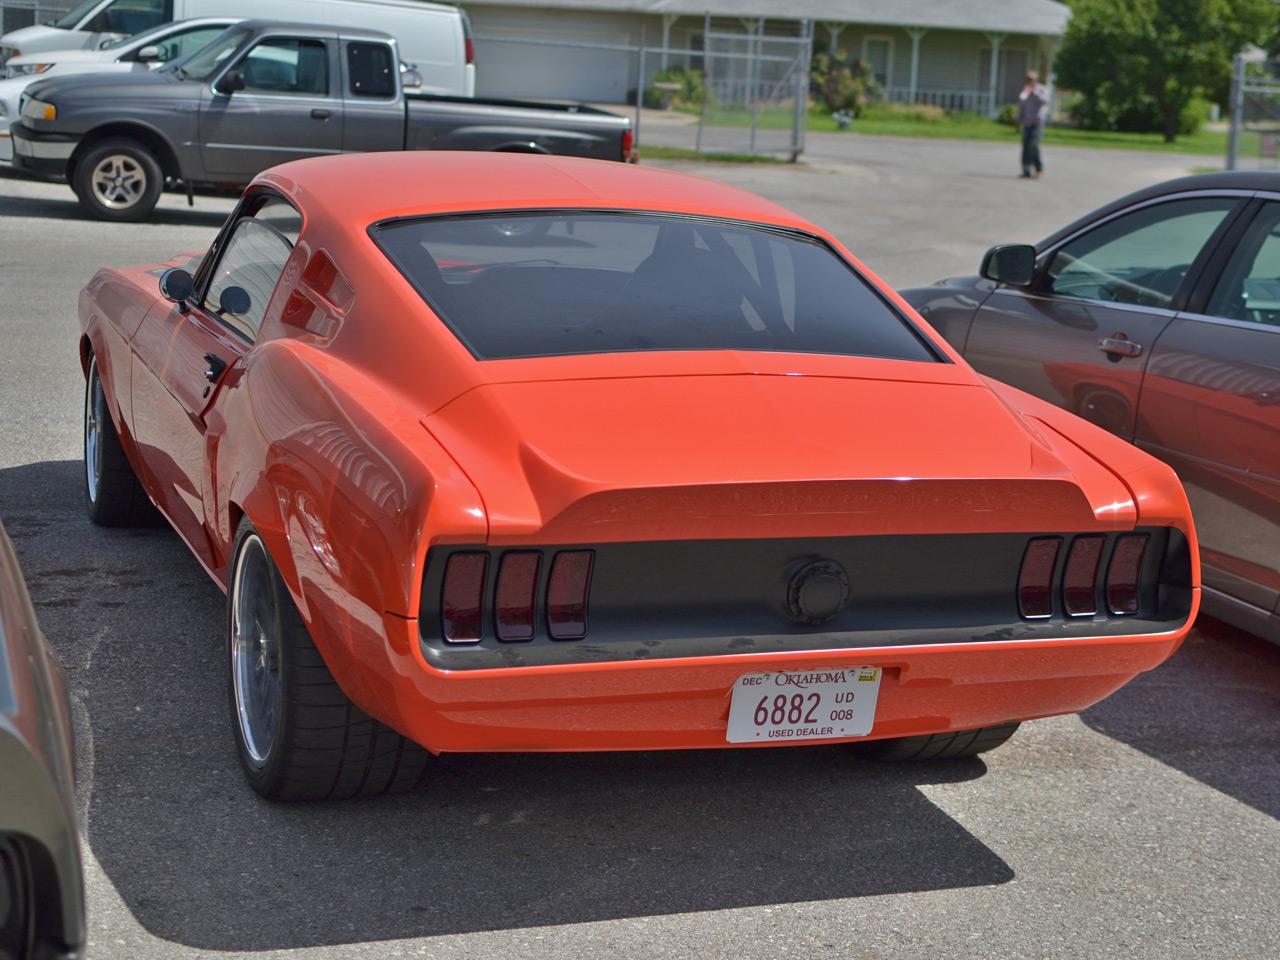 Meet the Villain of CR Supercars   1968 Ford Mustang Villain